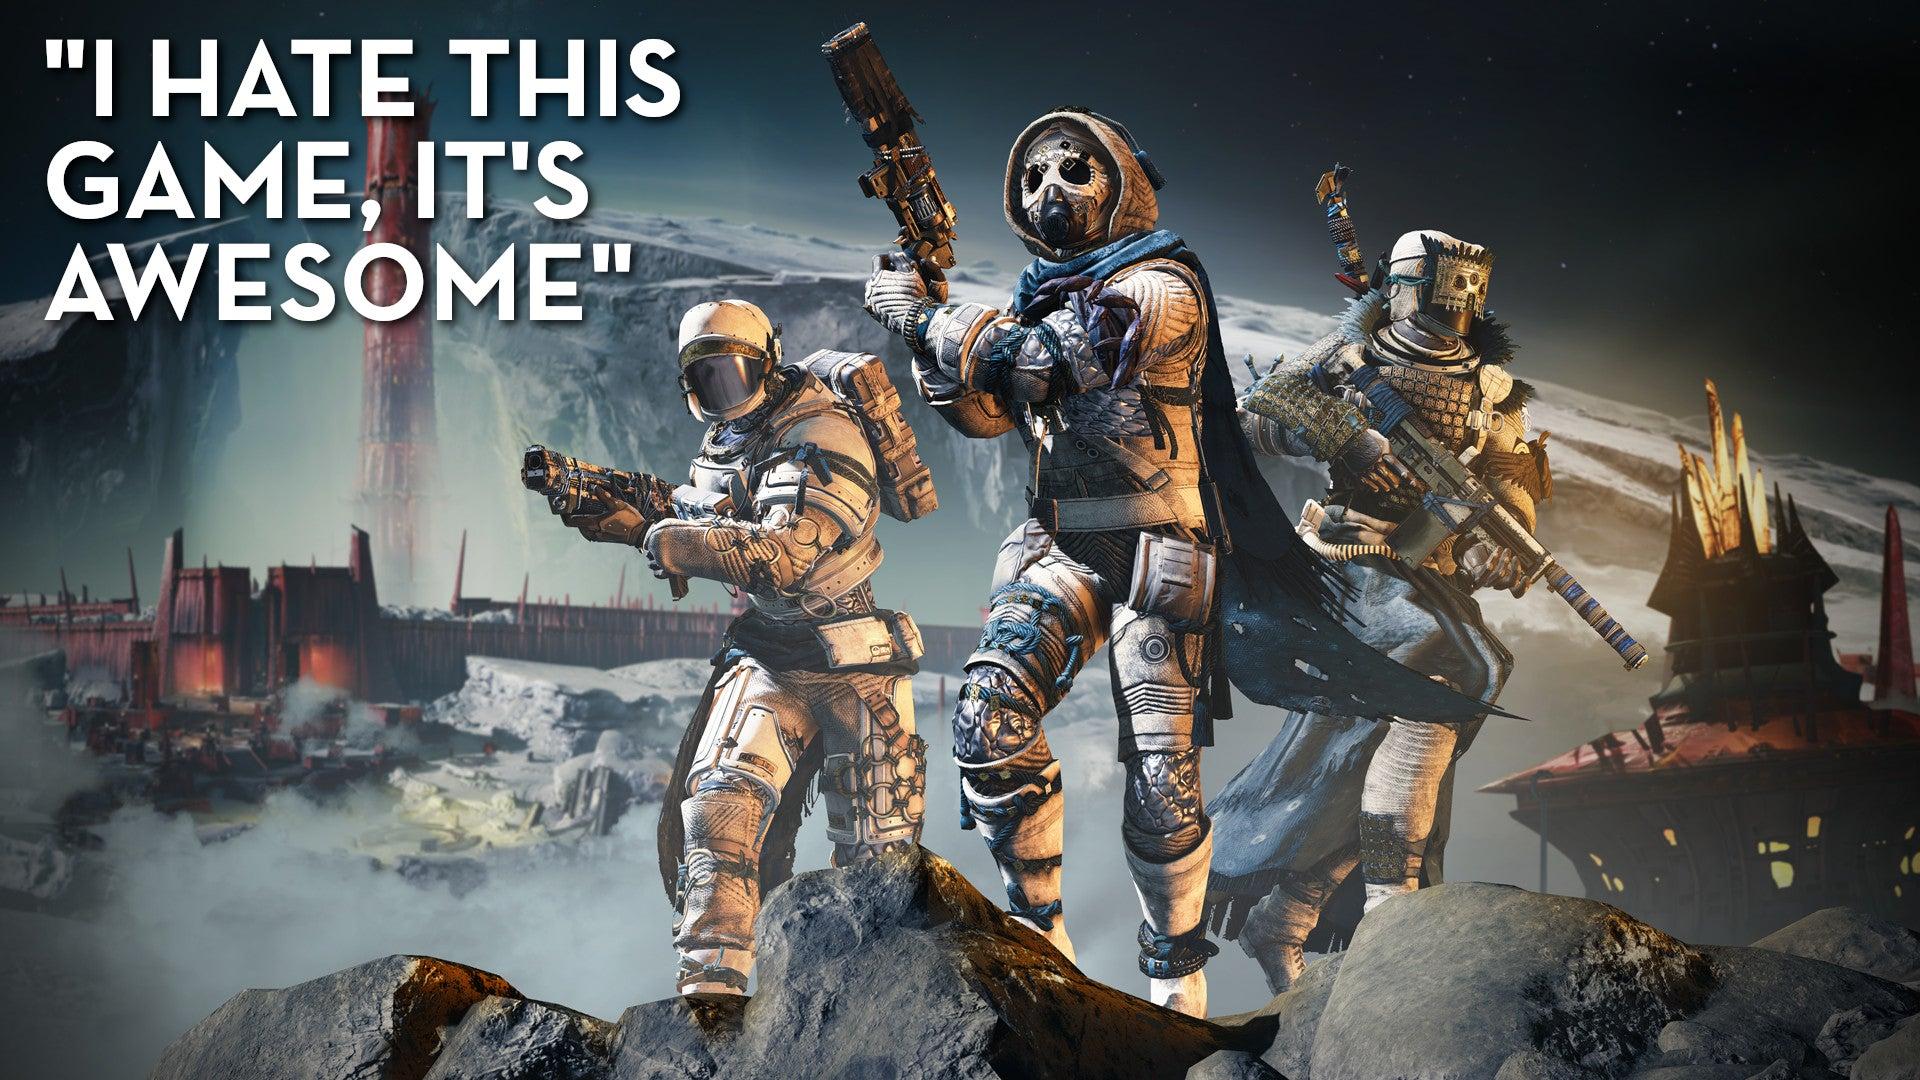 Destiny 2, As Told By Steam Reviews